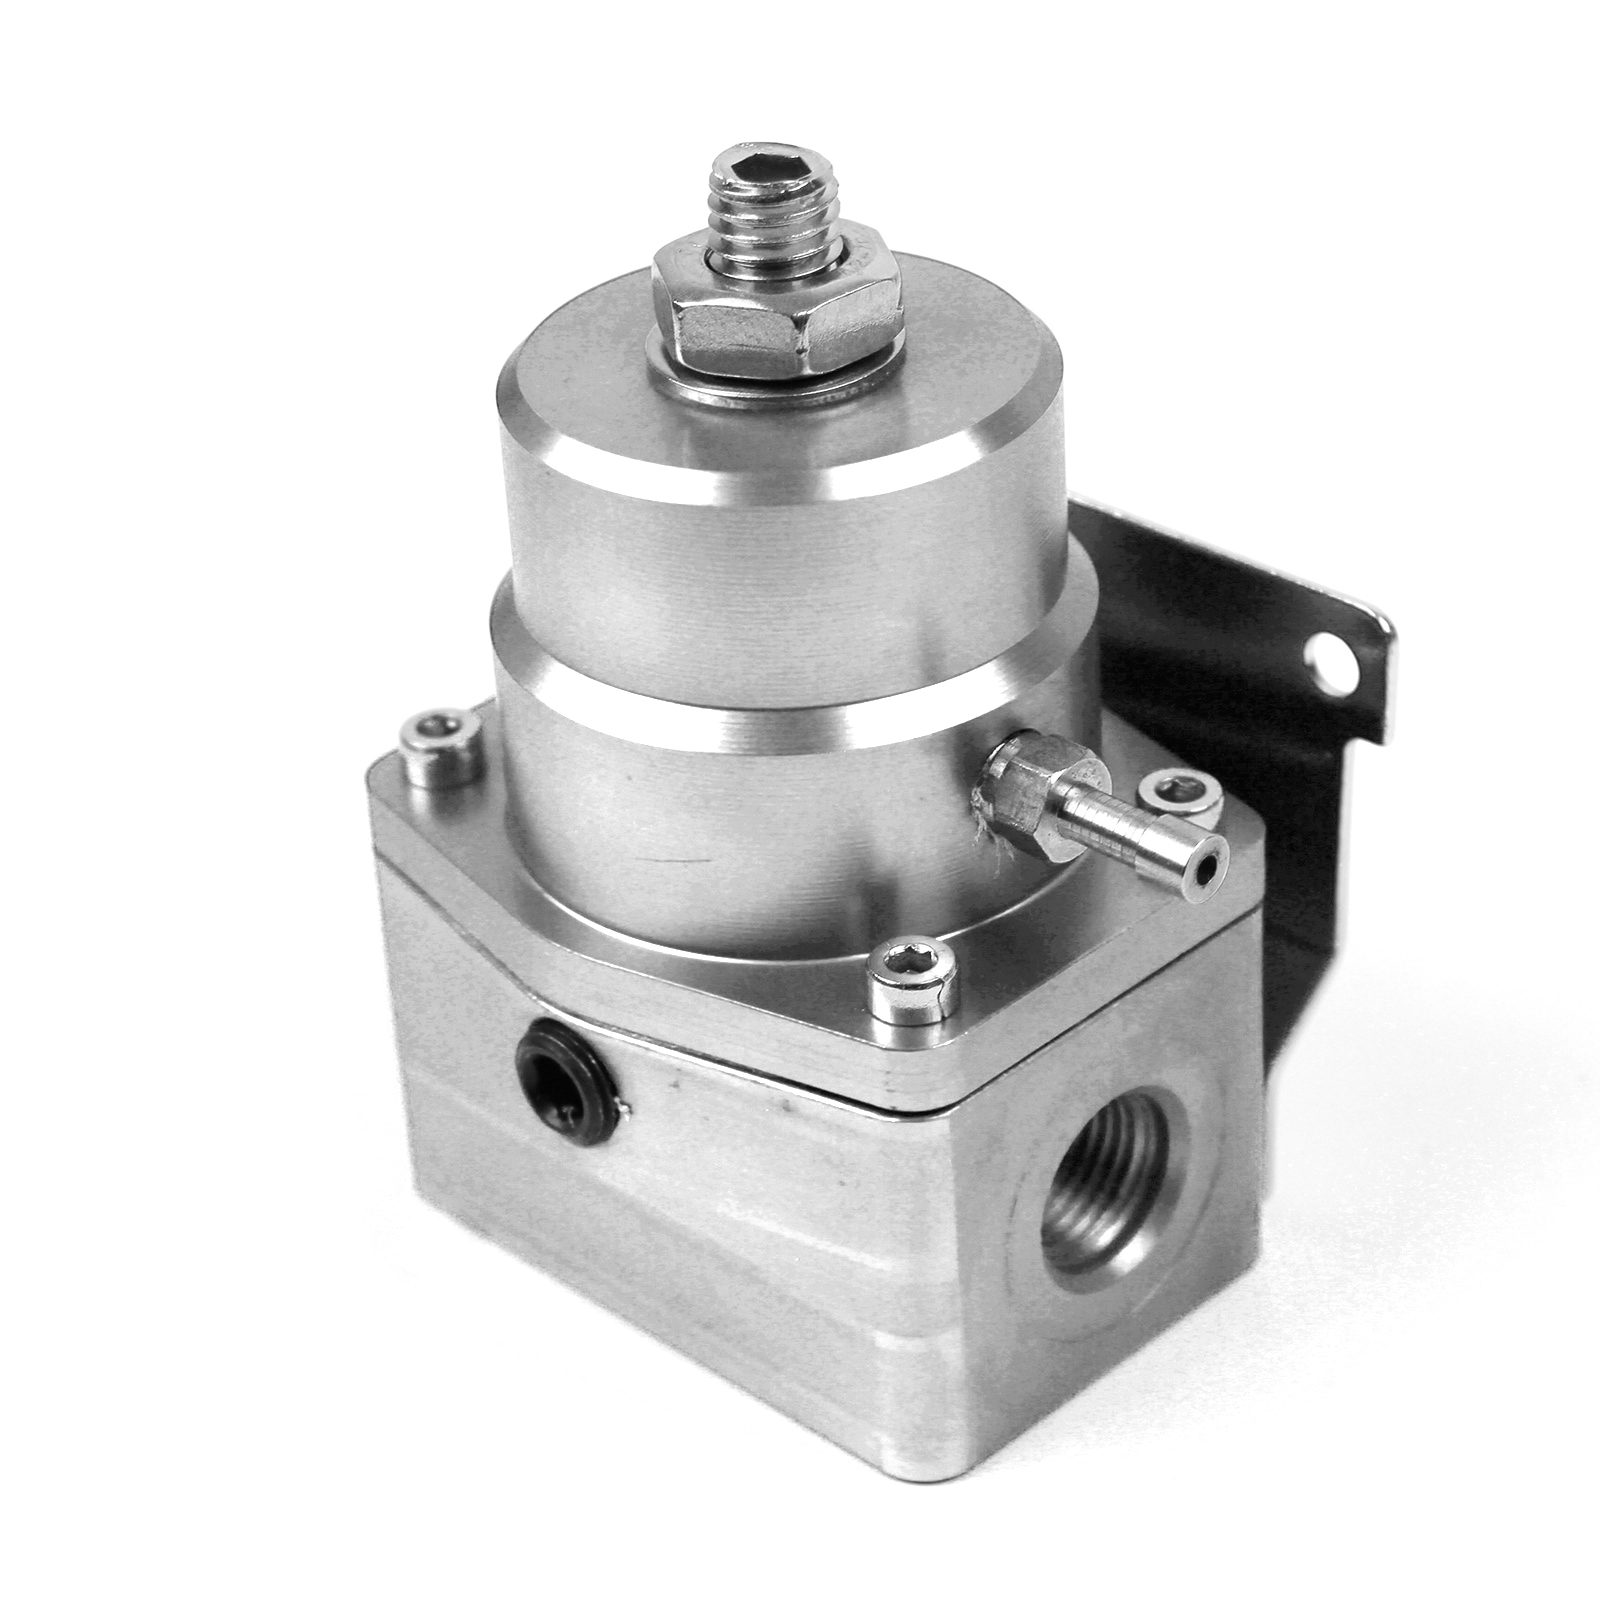 Universal - 6 AN EFI Fuel Pressure Regulator Silver